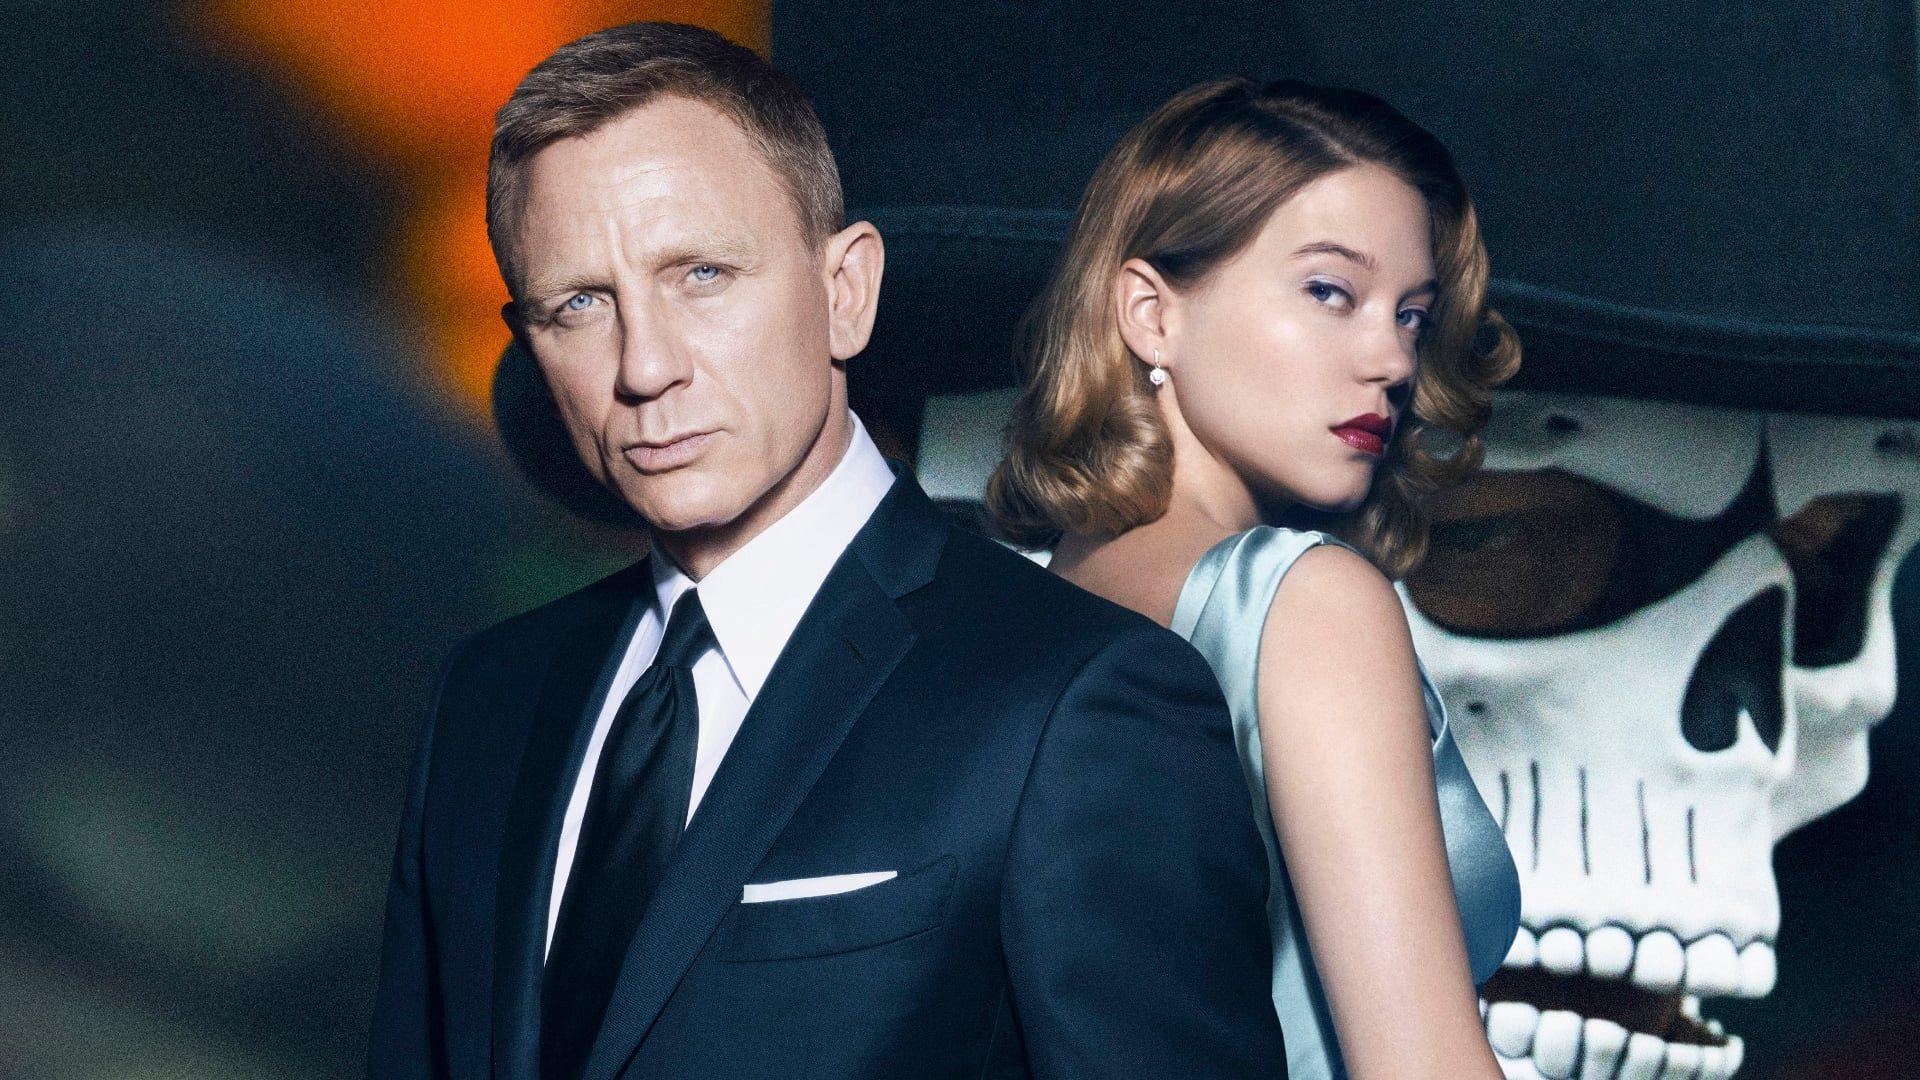 007 Spectre A Fantom Visszater 2015 Online Teljes Film Filmek Magyarul Letoltes Hd Egy Multbol Szarmazo Ti Movies Streaming Movies Online Free Movies Online